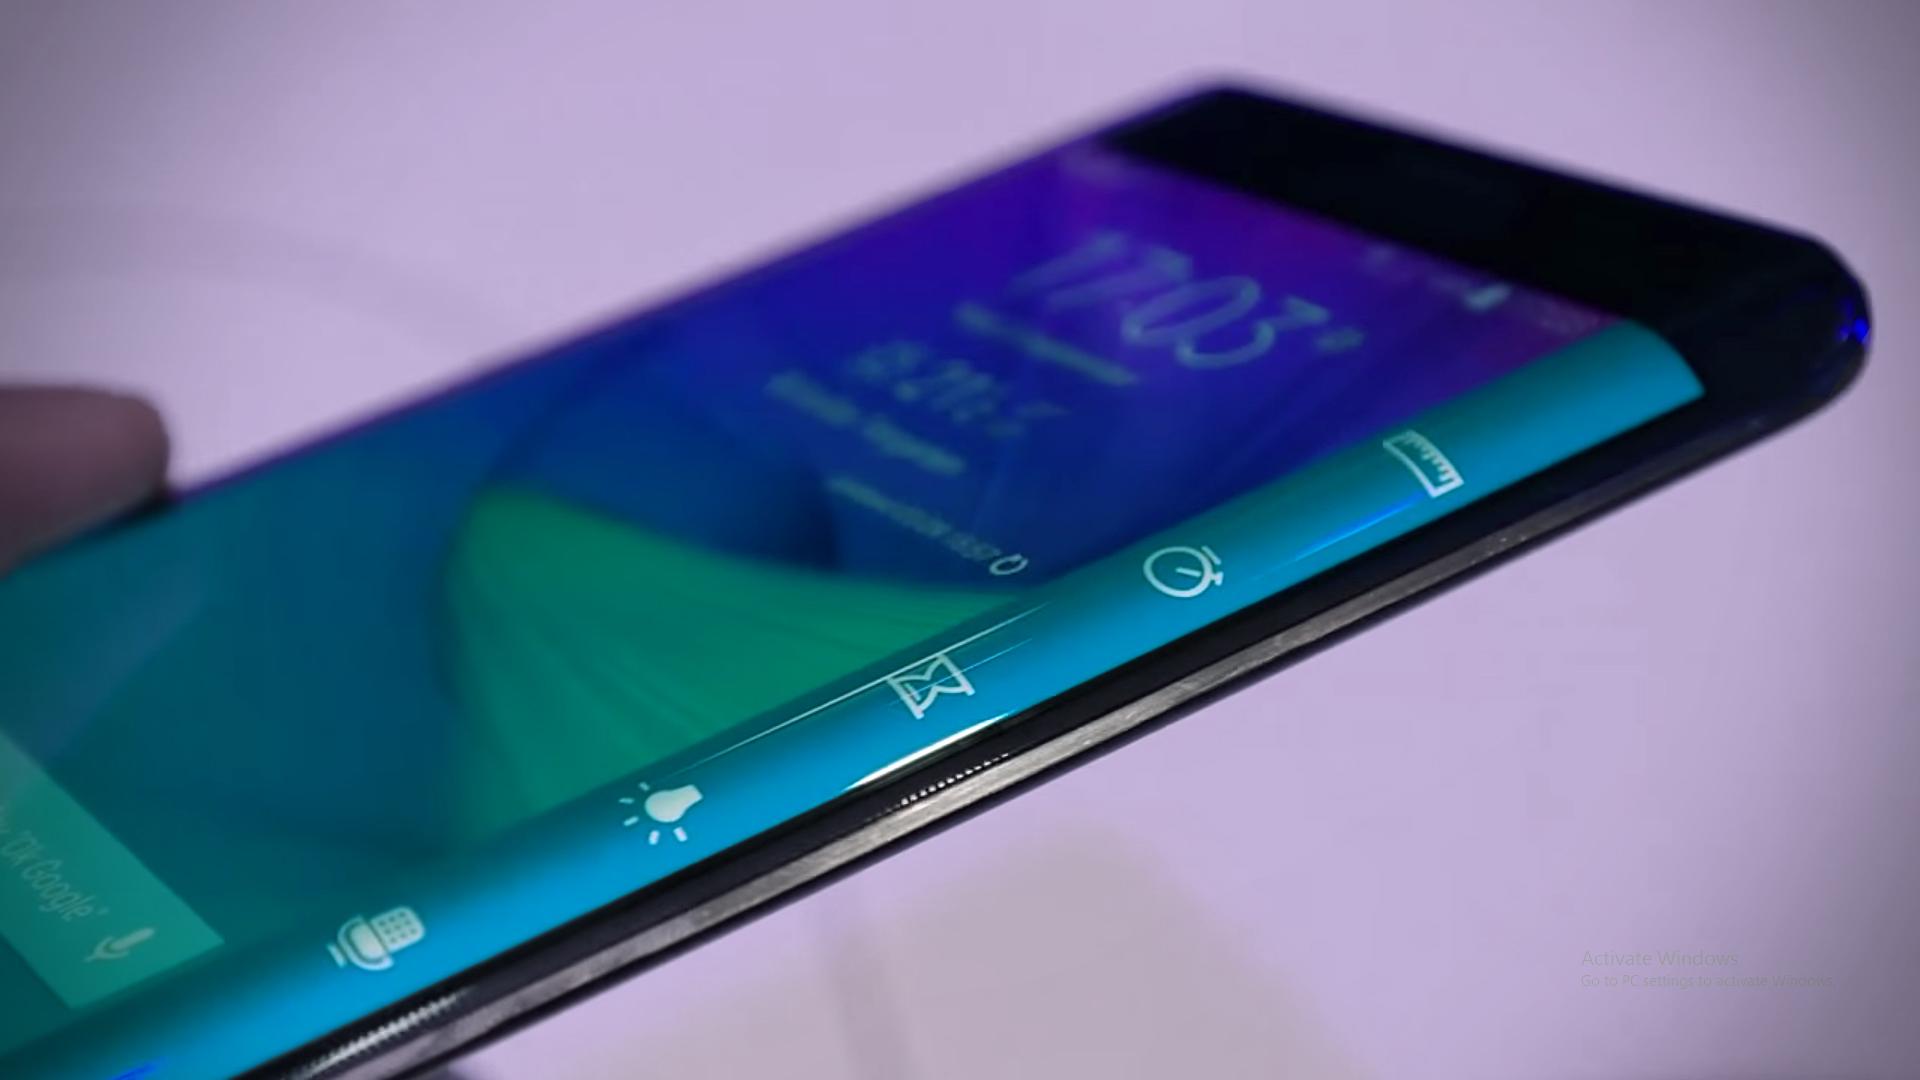 Cum explică Samsung designul și utilitatea Galaxy Note Edge [Interviu – IFA 2014]